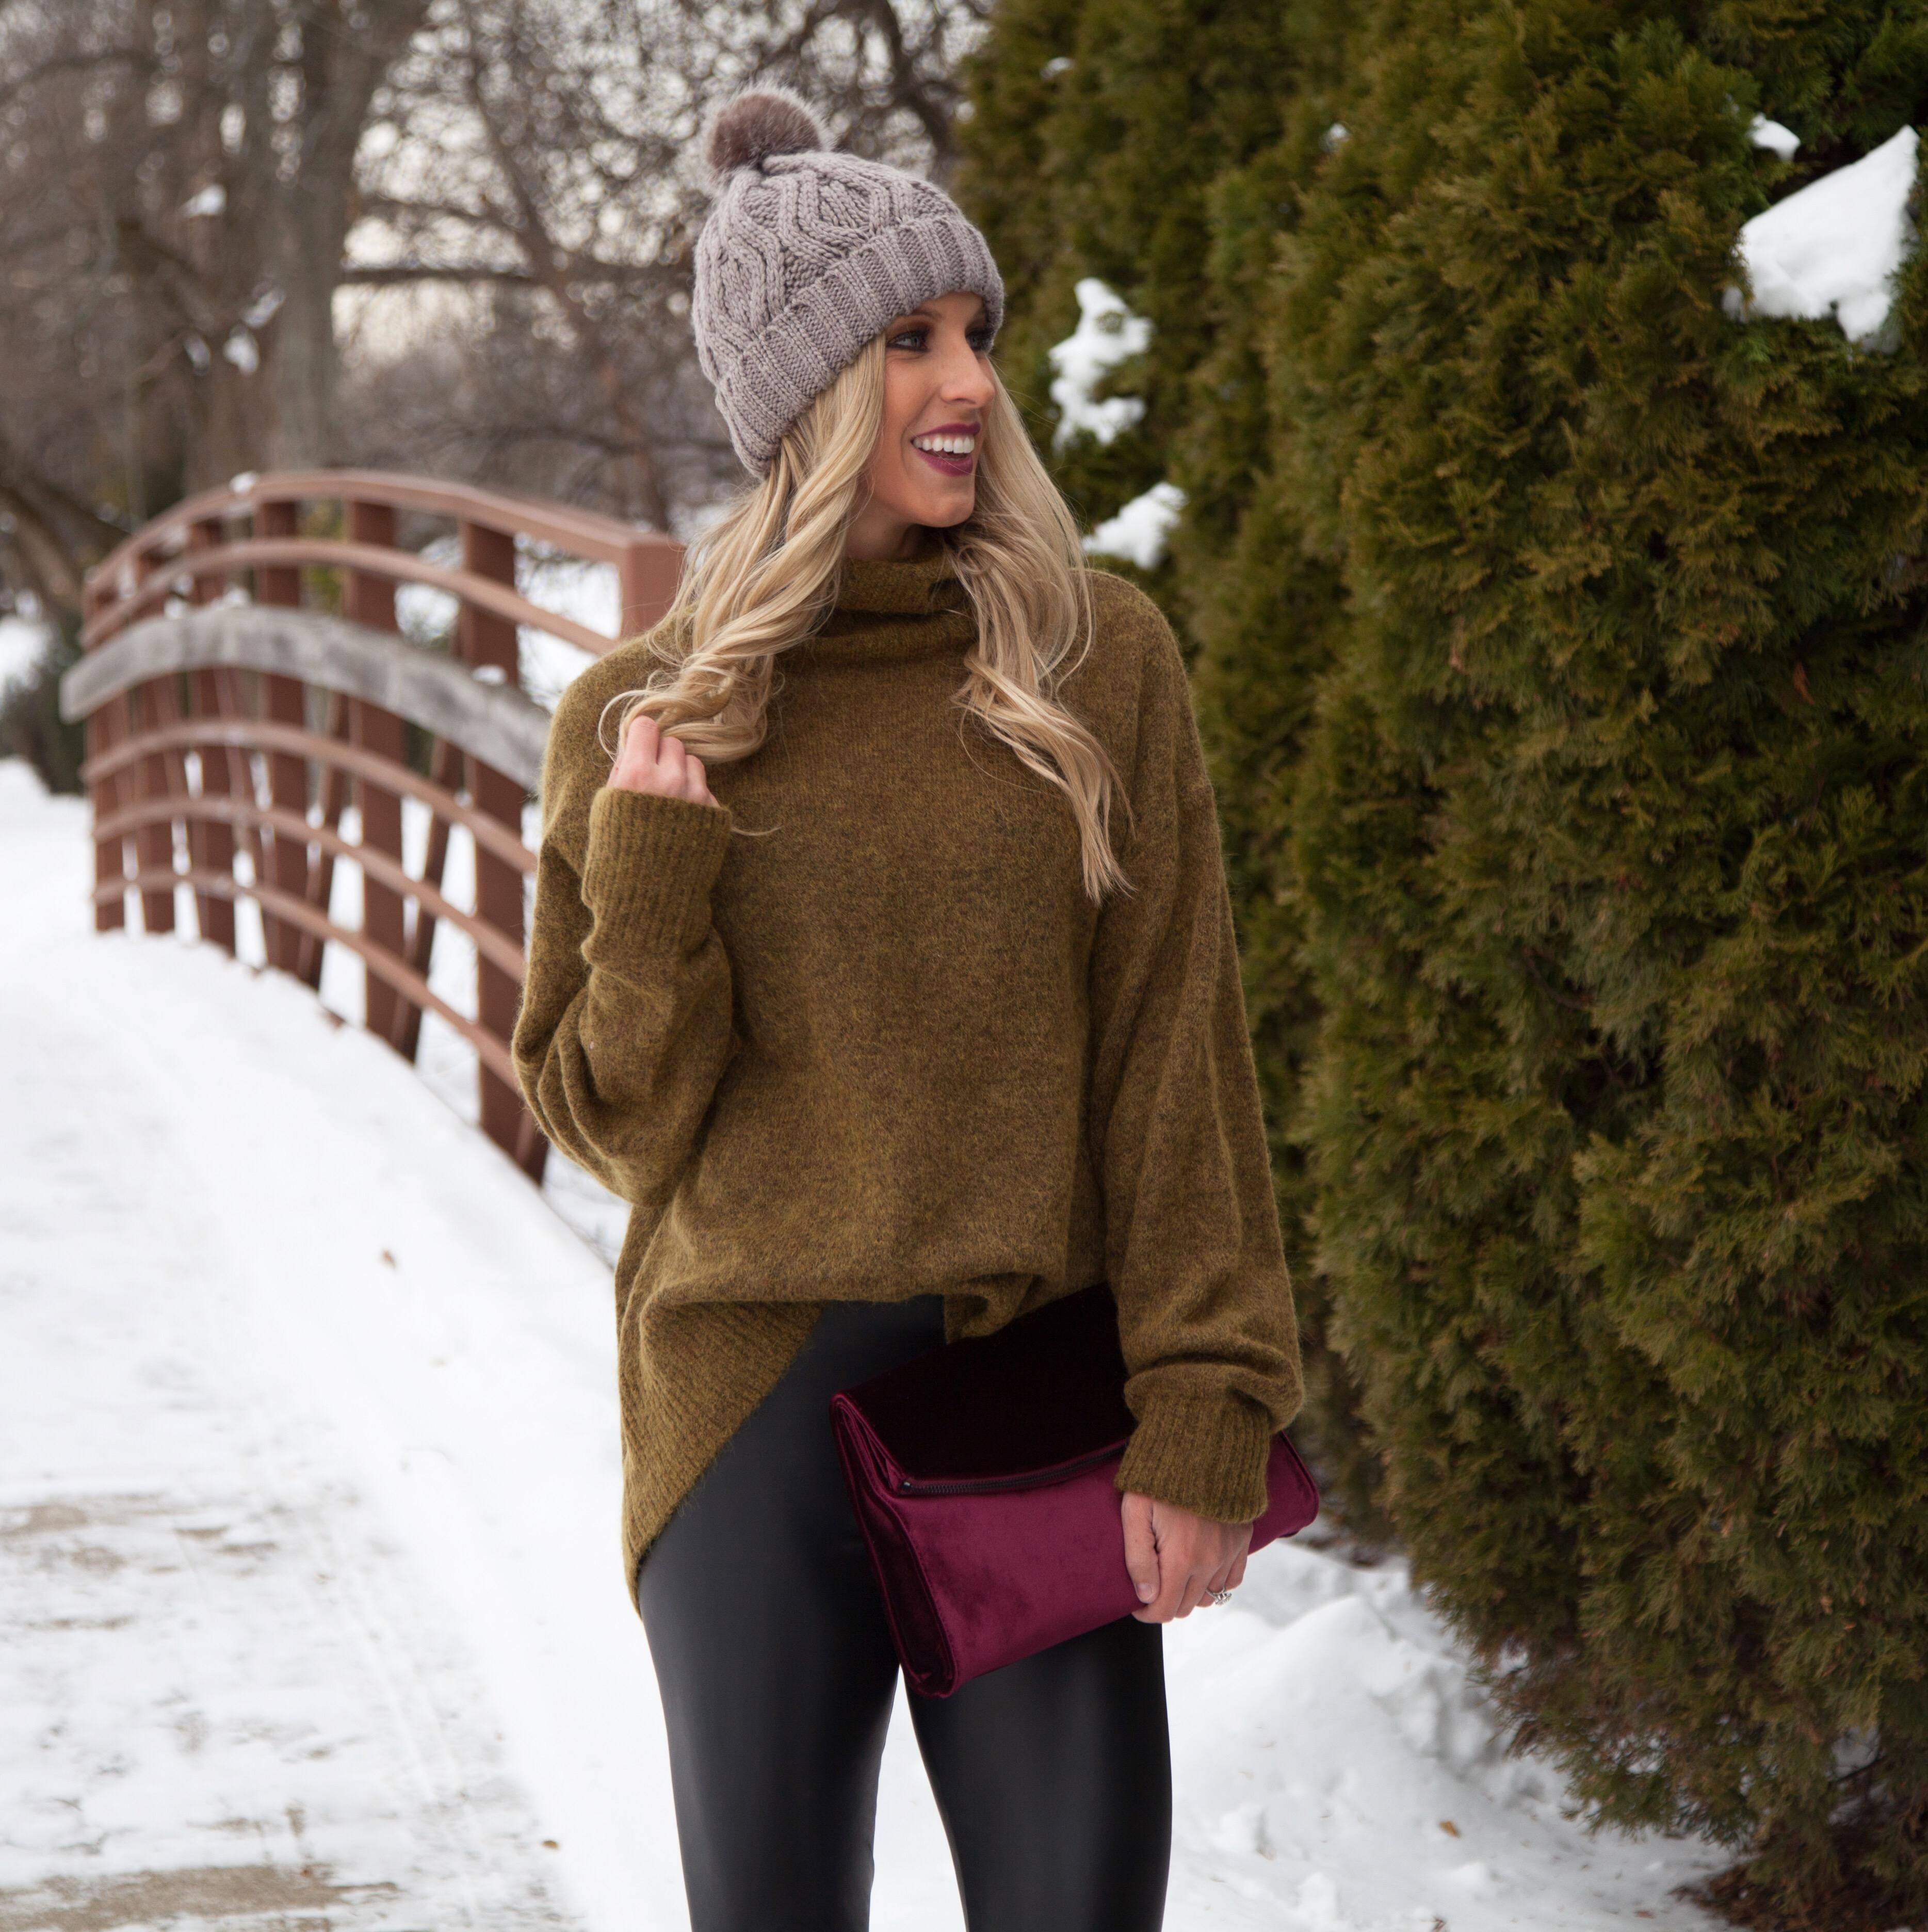 Turtleneck + Winter Boots